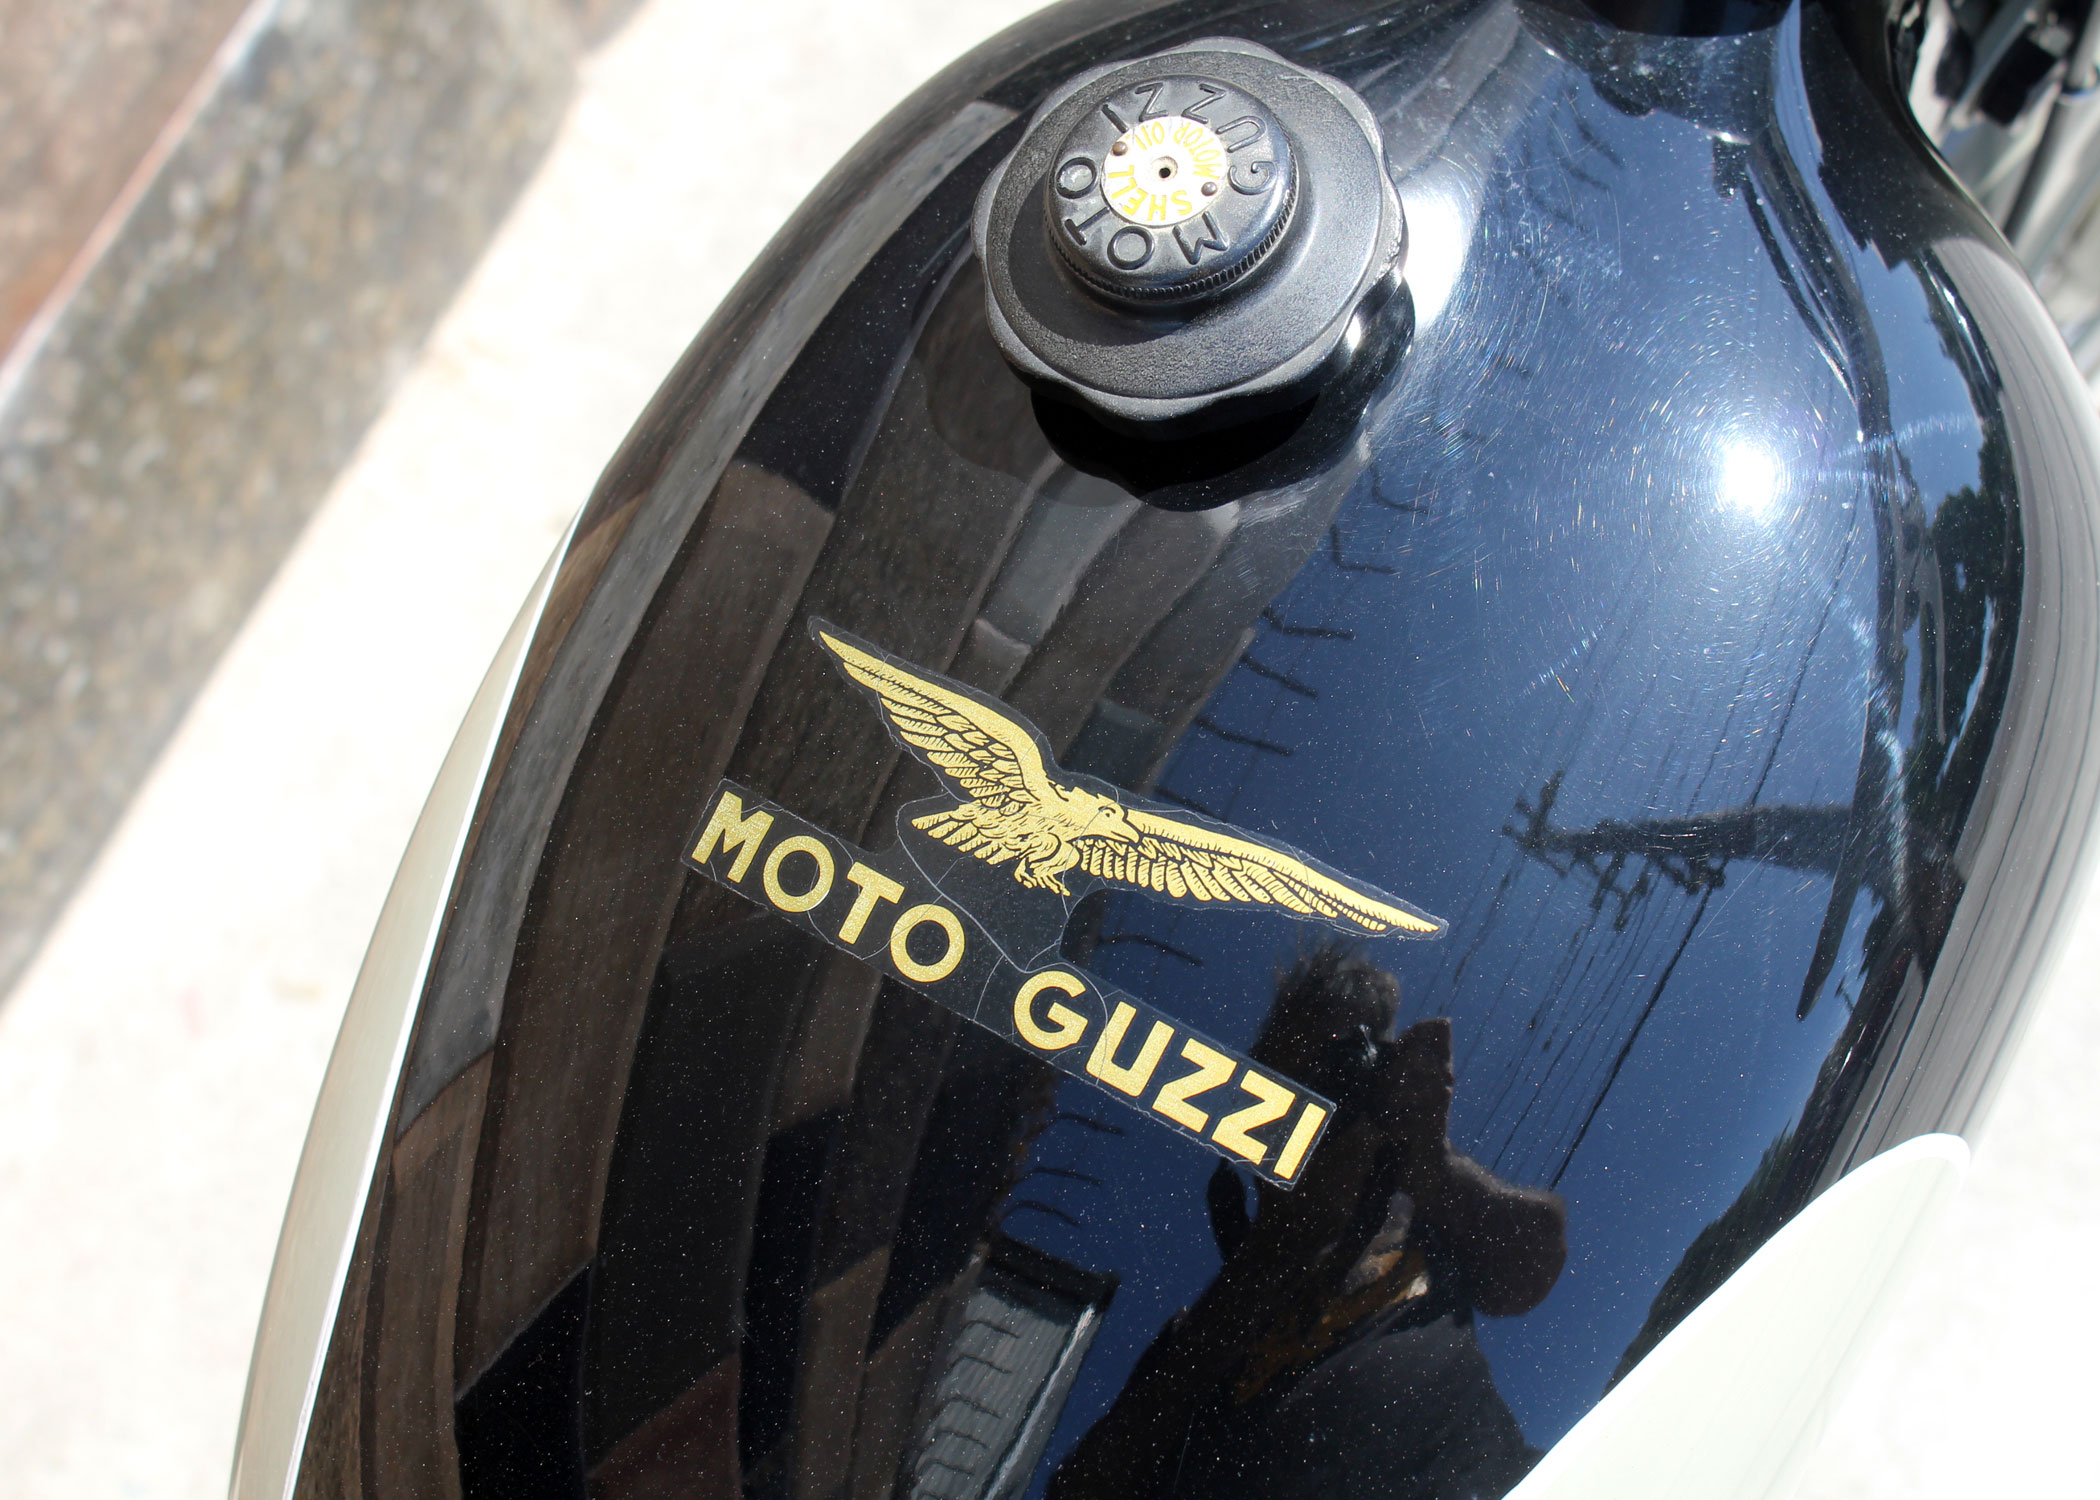 D198_MotoGuzzi_Zigolo_3.jpg